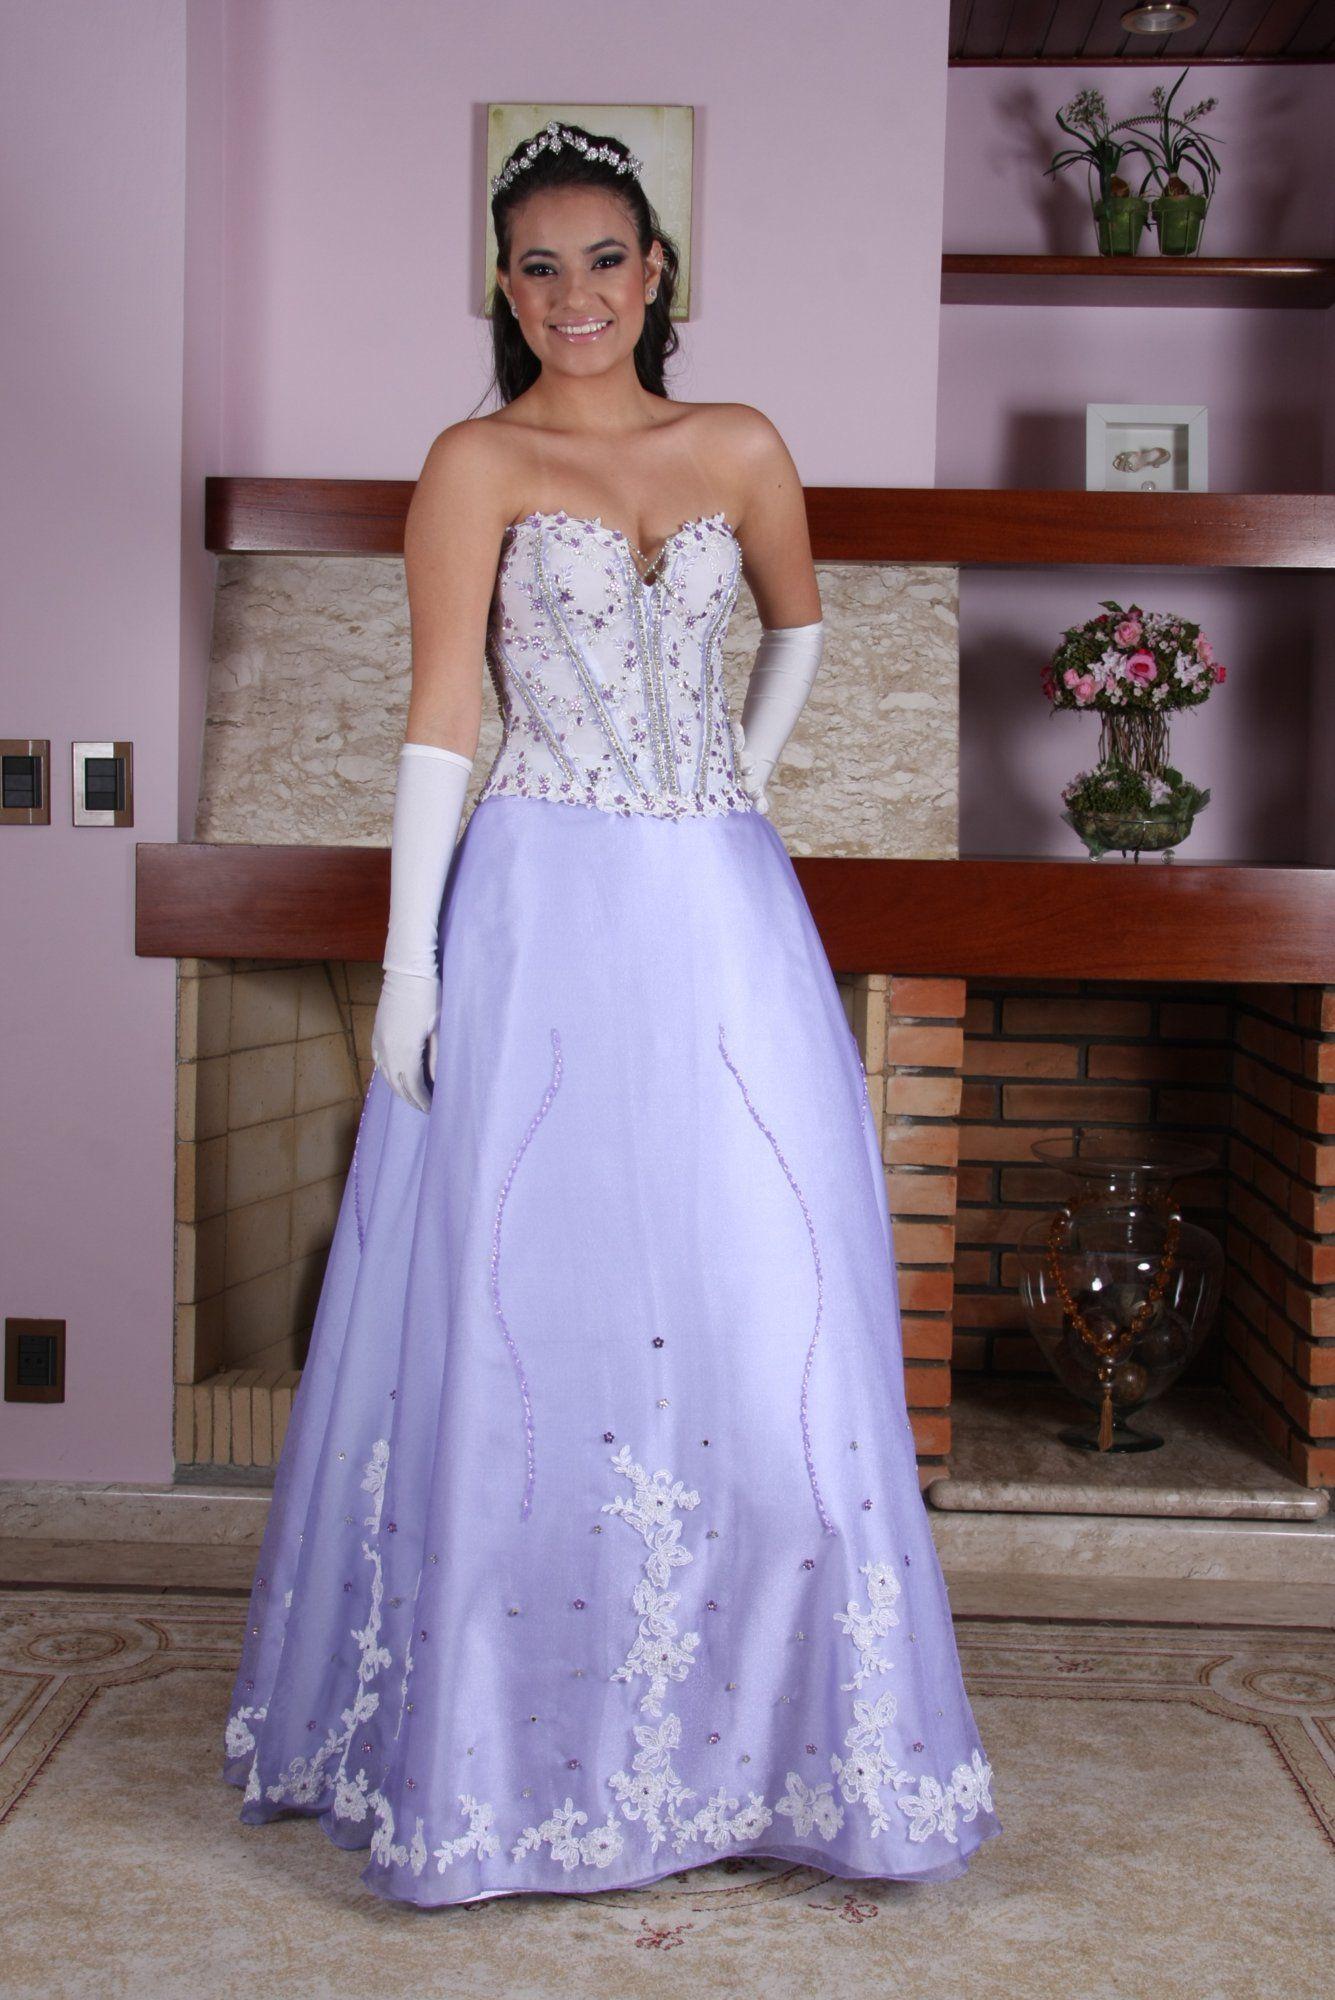 Vestido de Debutante Lilas - 13 - Hipnose Alta Costura e Spa para Noivas e Noivos - Campinas - SP Vestido de Debutante, Vestido de Debutante Lilas, Hipnose Alta Costura